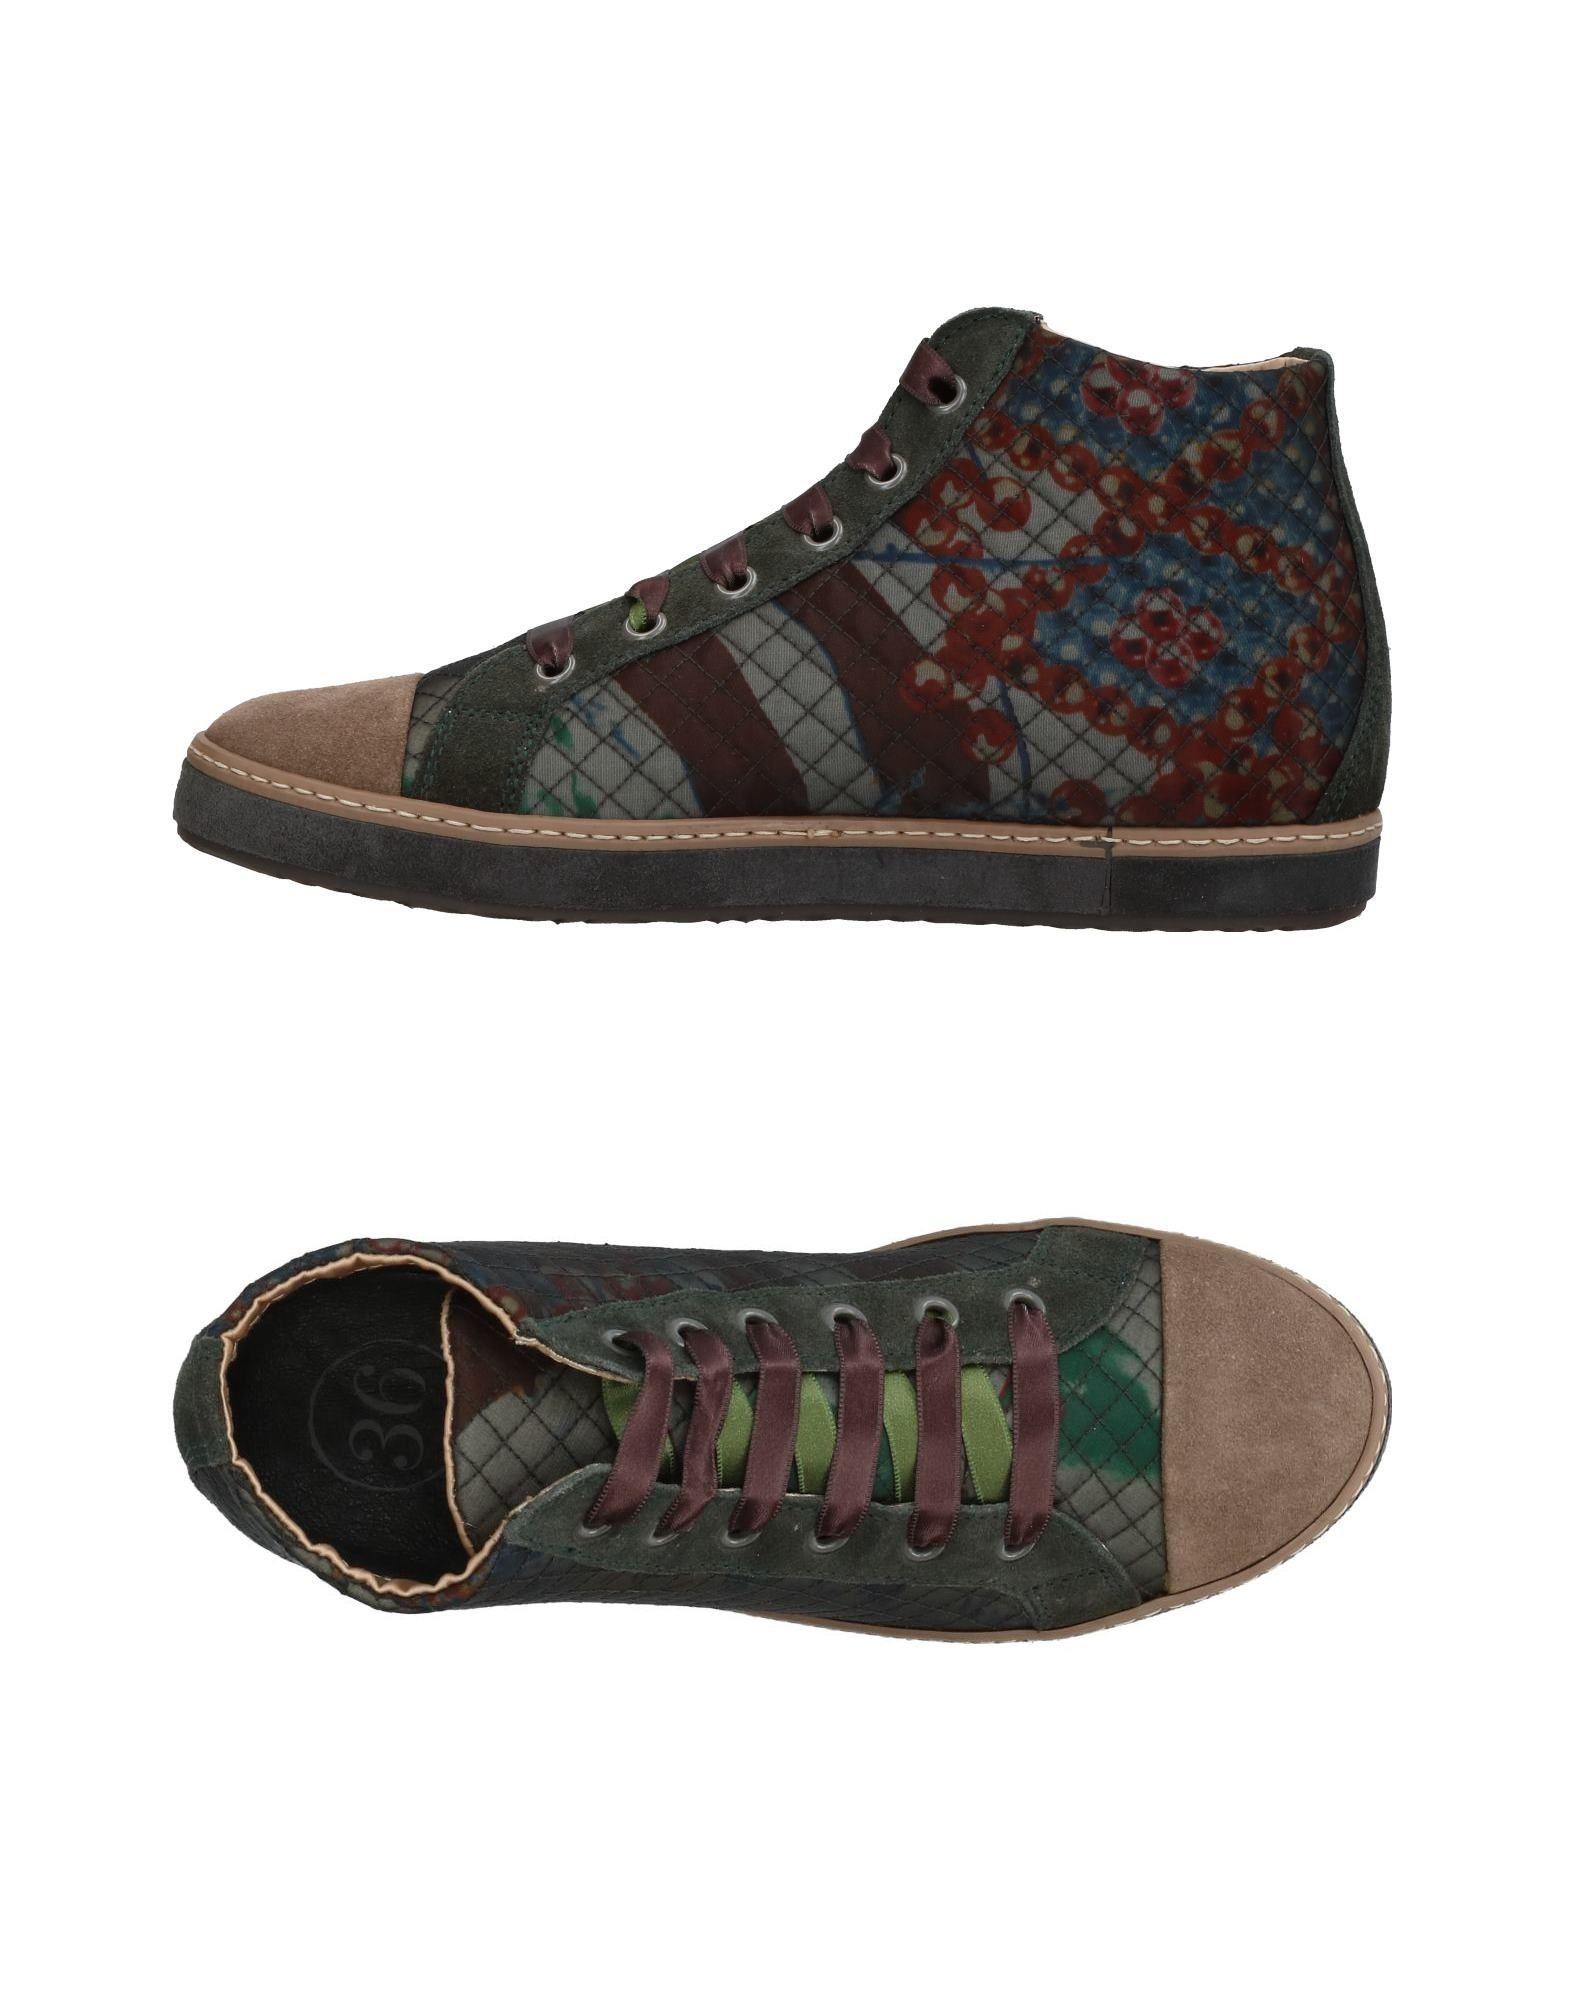 Soisire Soiebleu Sneakers Damen  11337781UO Gute Qualität beliebte Schuhe